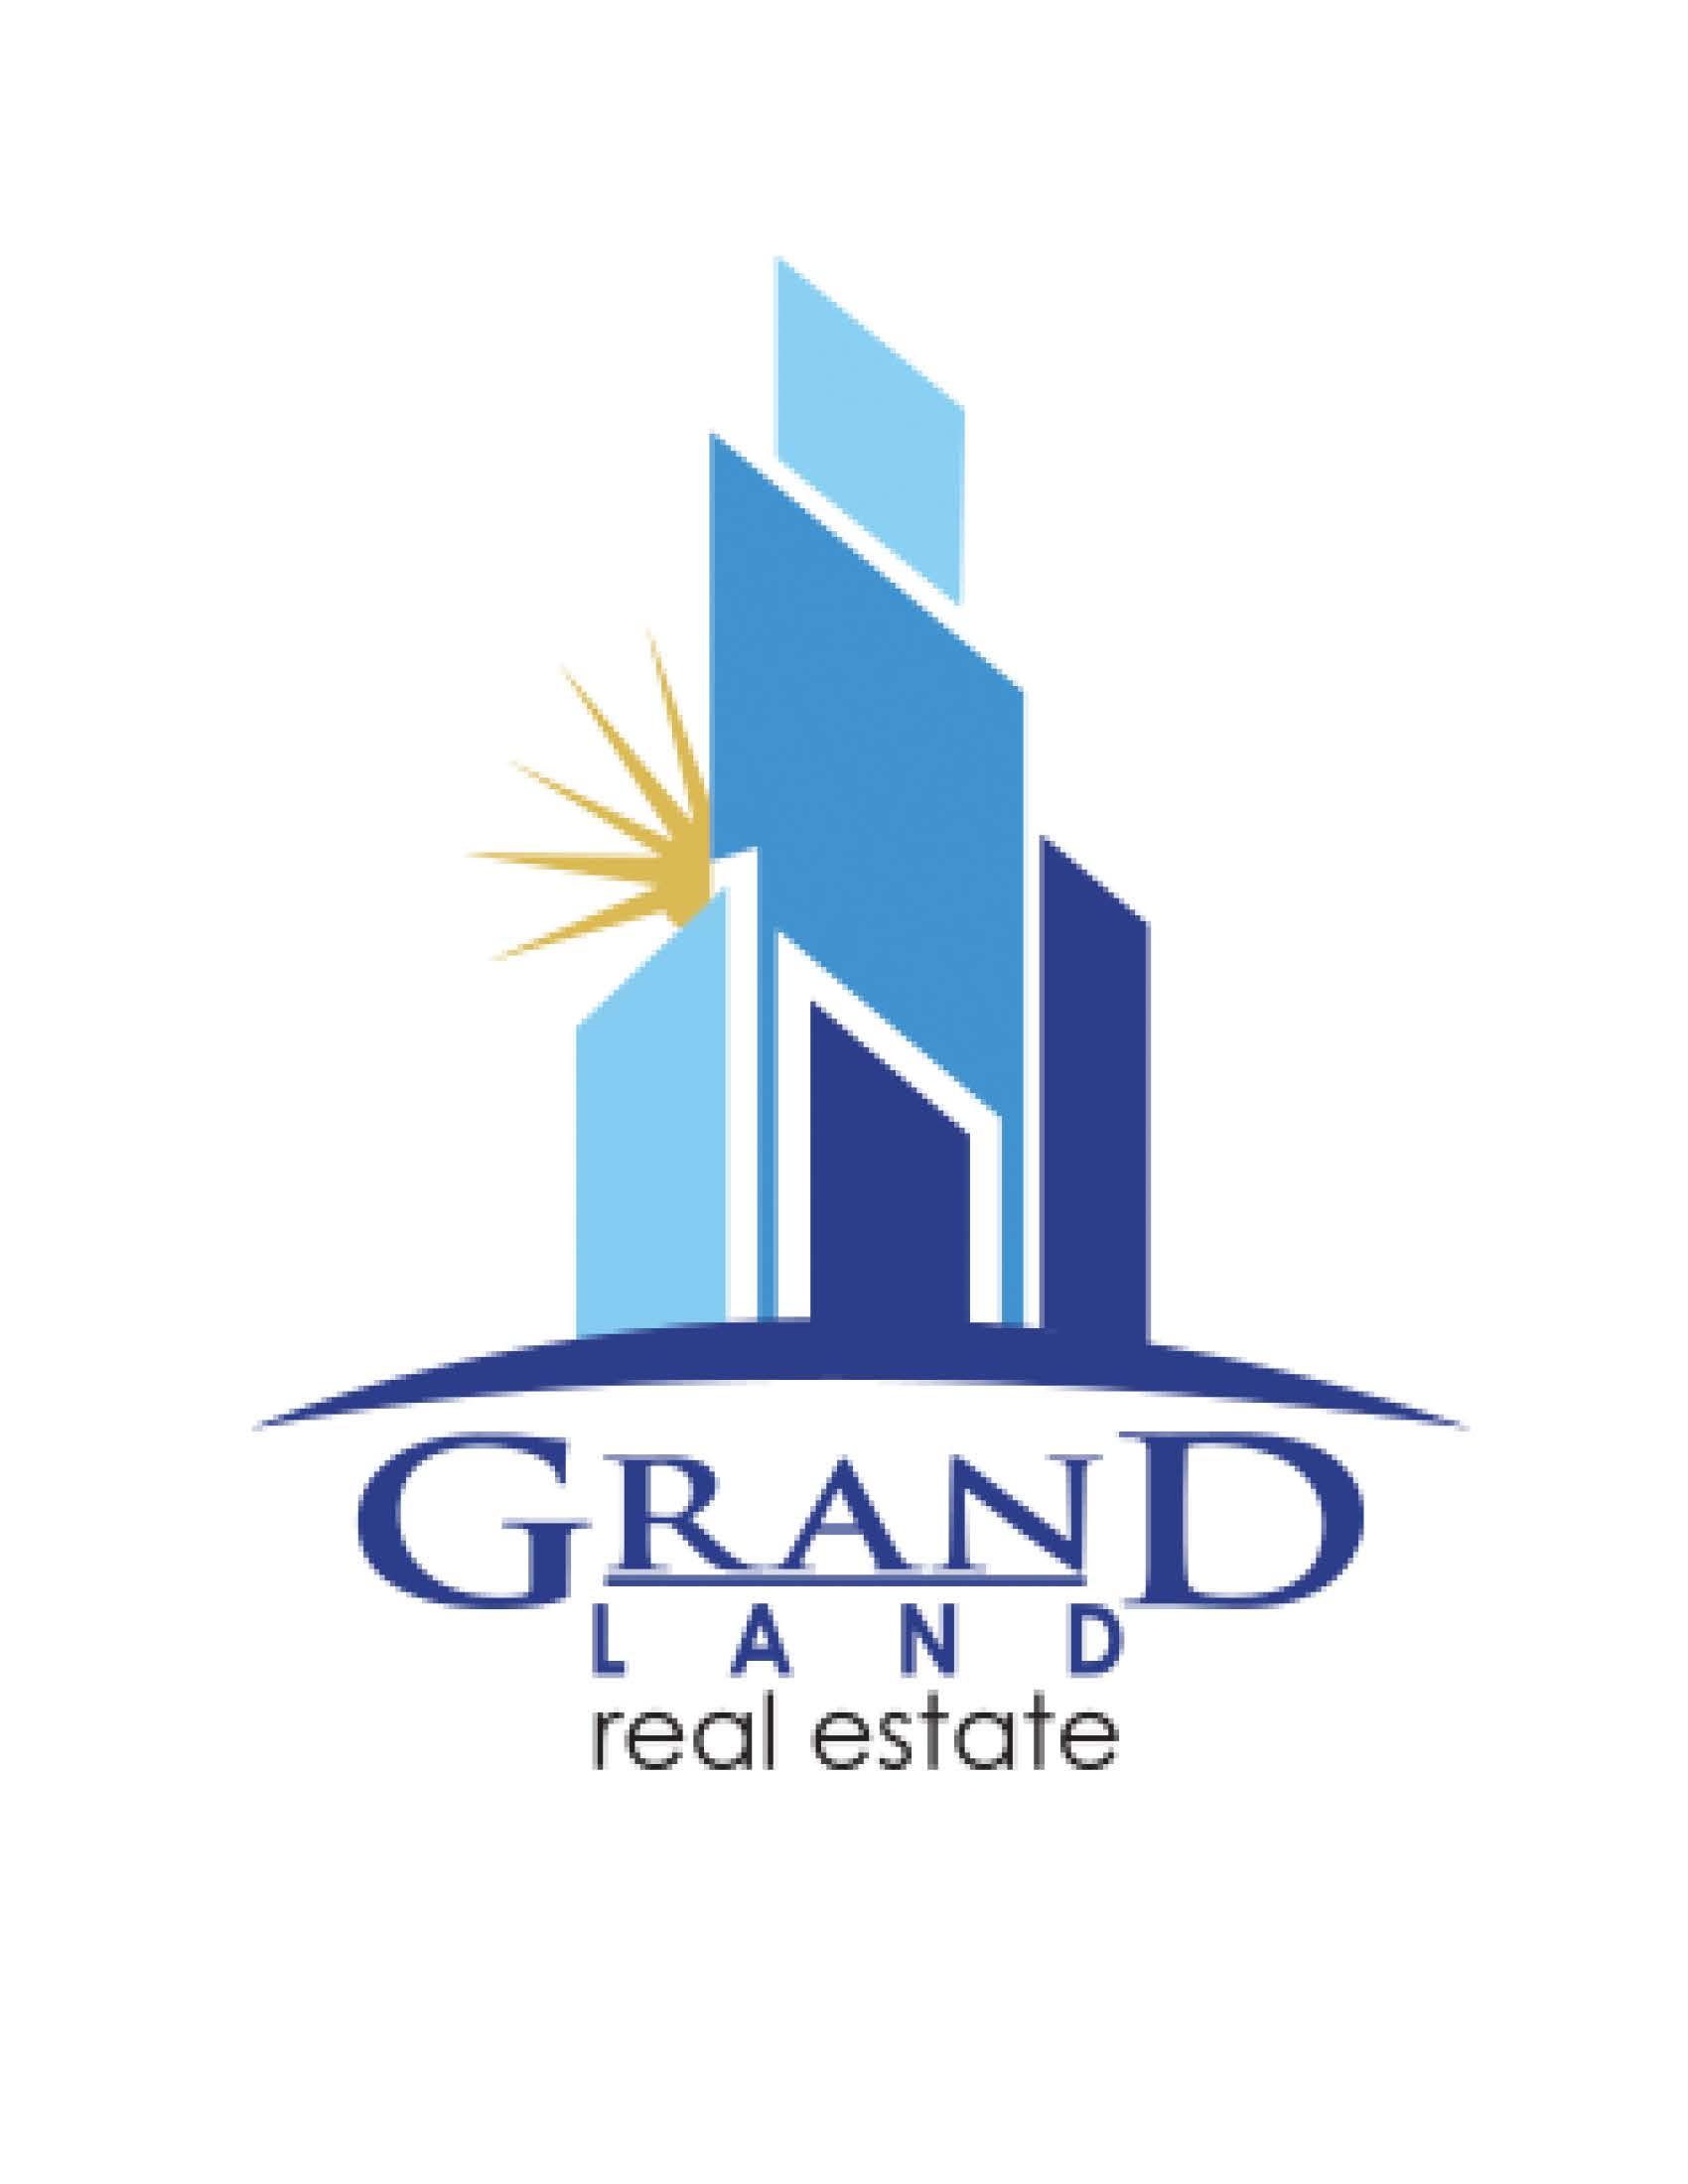 Administrative Assistant Jobs in Real Estate in UAE   Dubizzle UAE